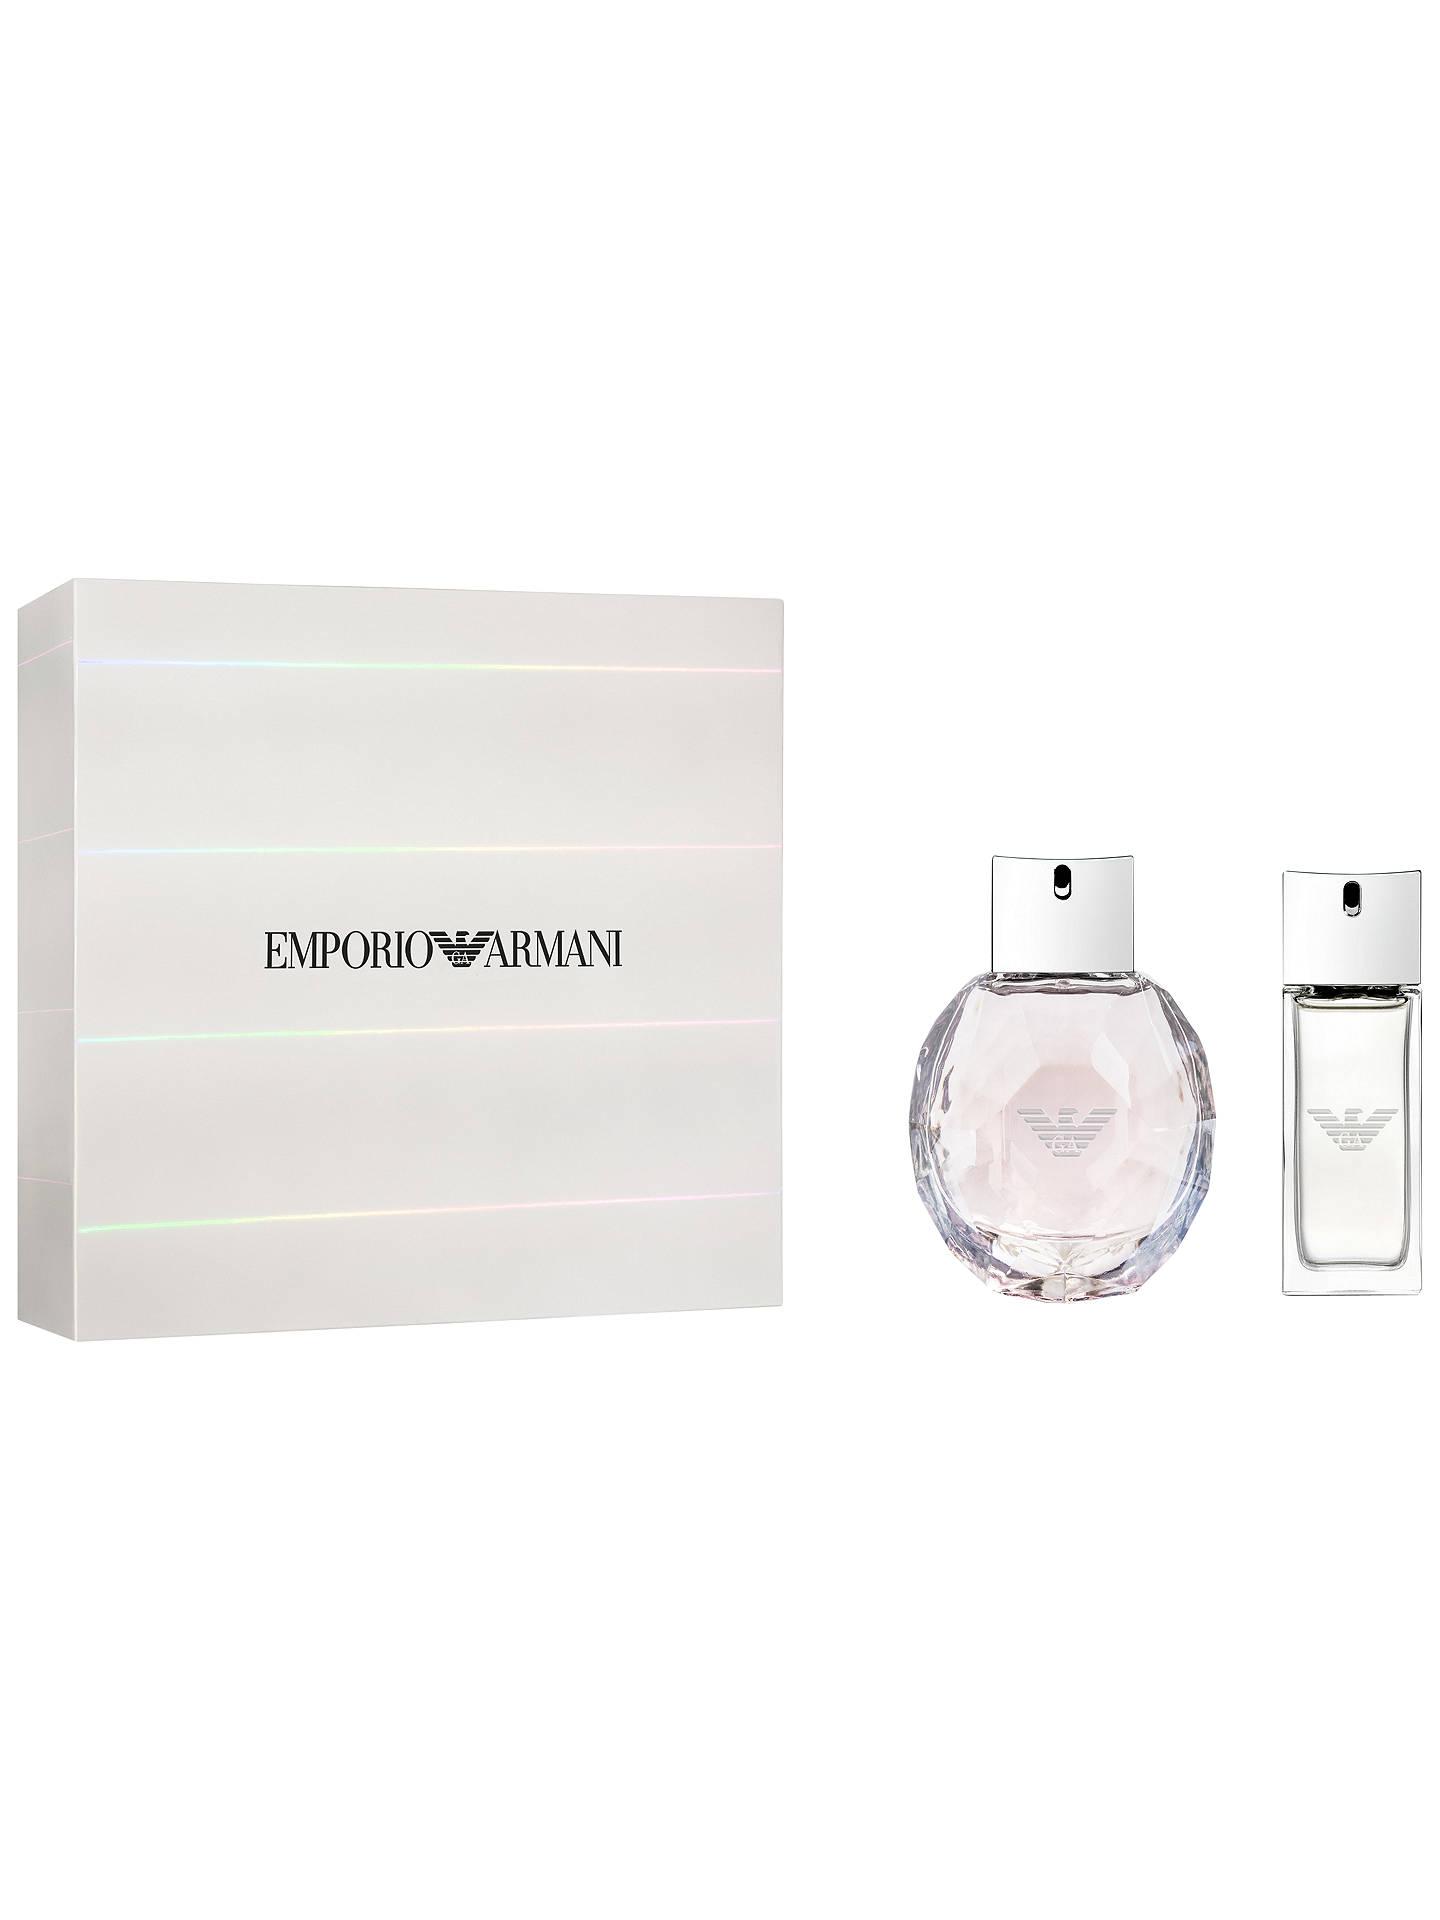 Emporio Armani Diamonds Rose 50ml Eau de Toilette Fragrance